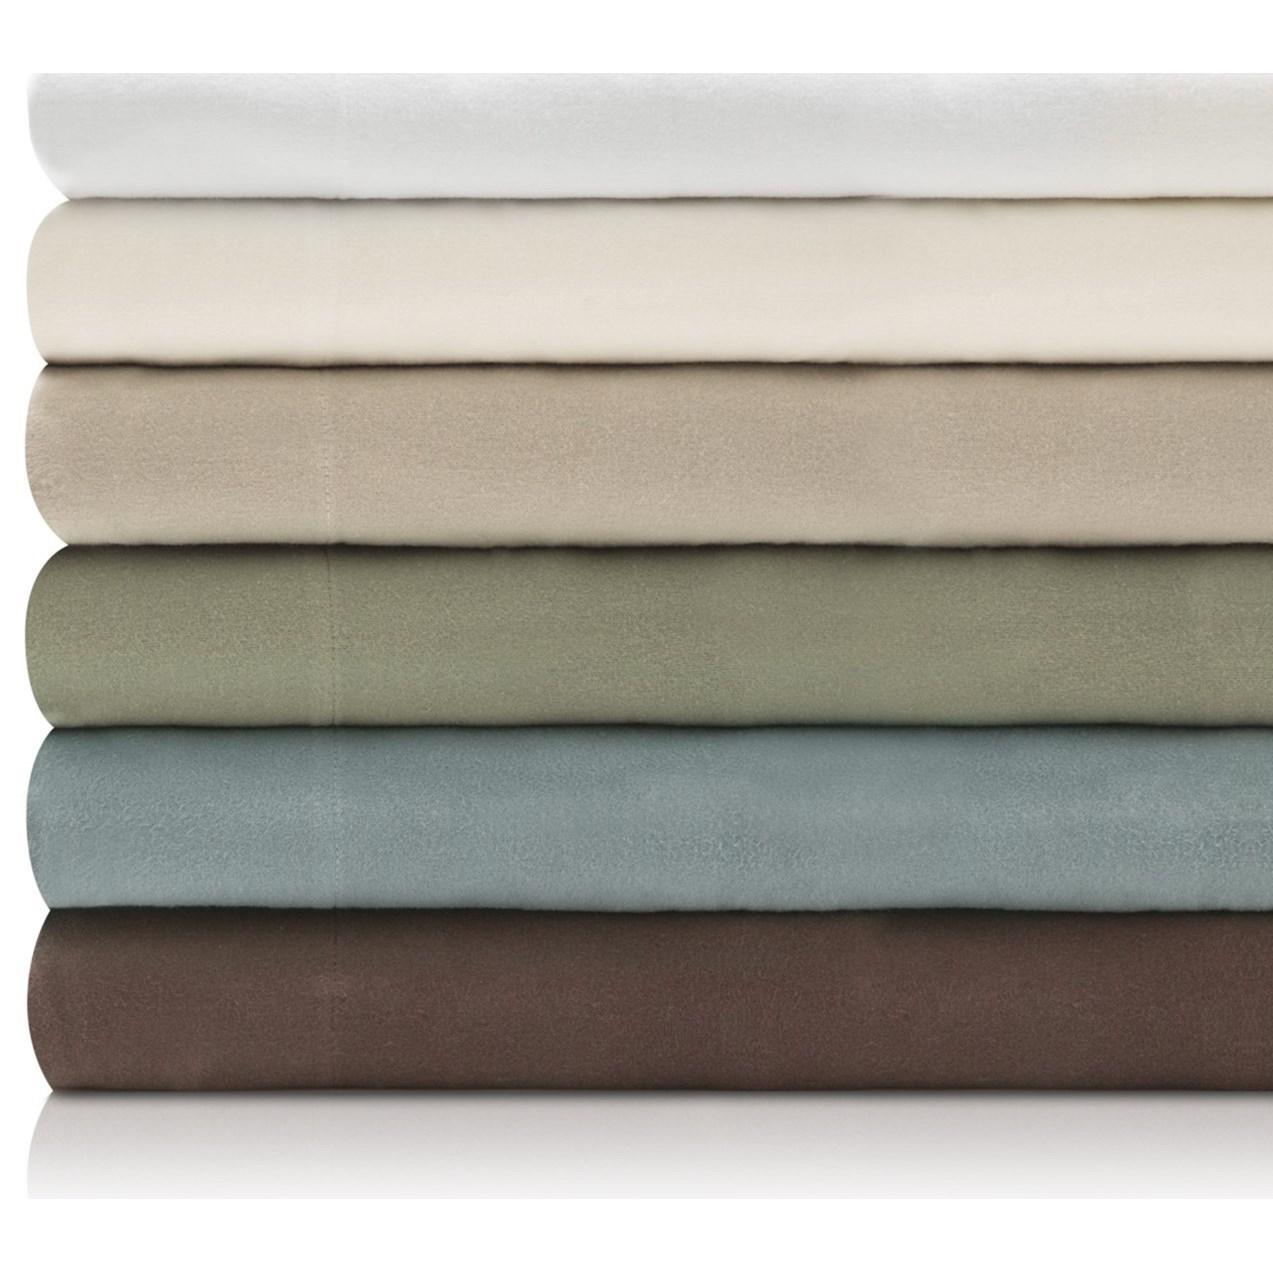 Malouf Portuguese Flannel Twin XL Woven™ Portuguese Flannel Sheet Set - Item Number: WO19TXPAFS